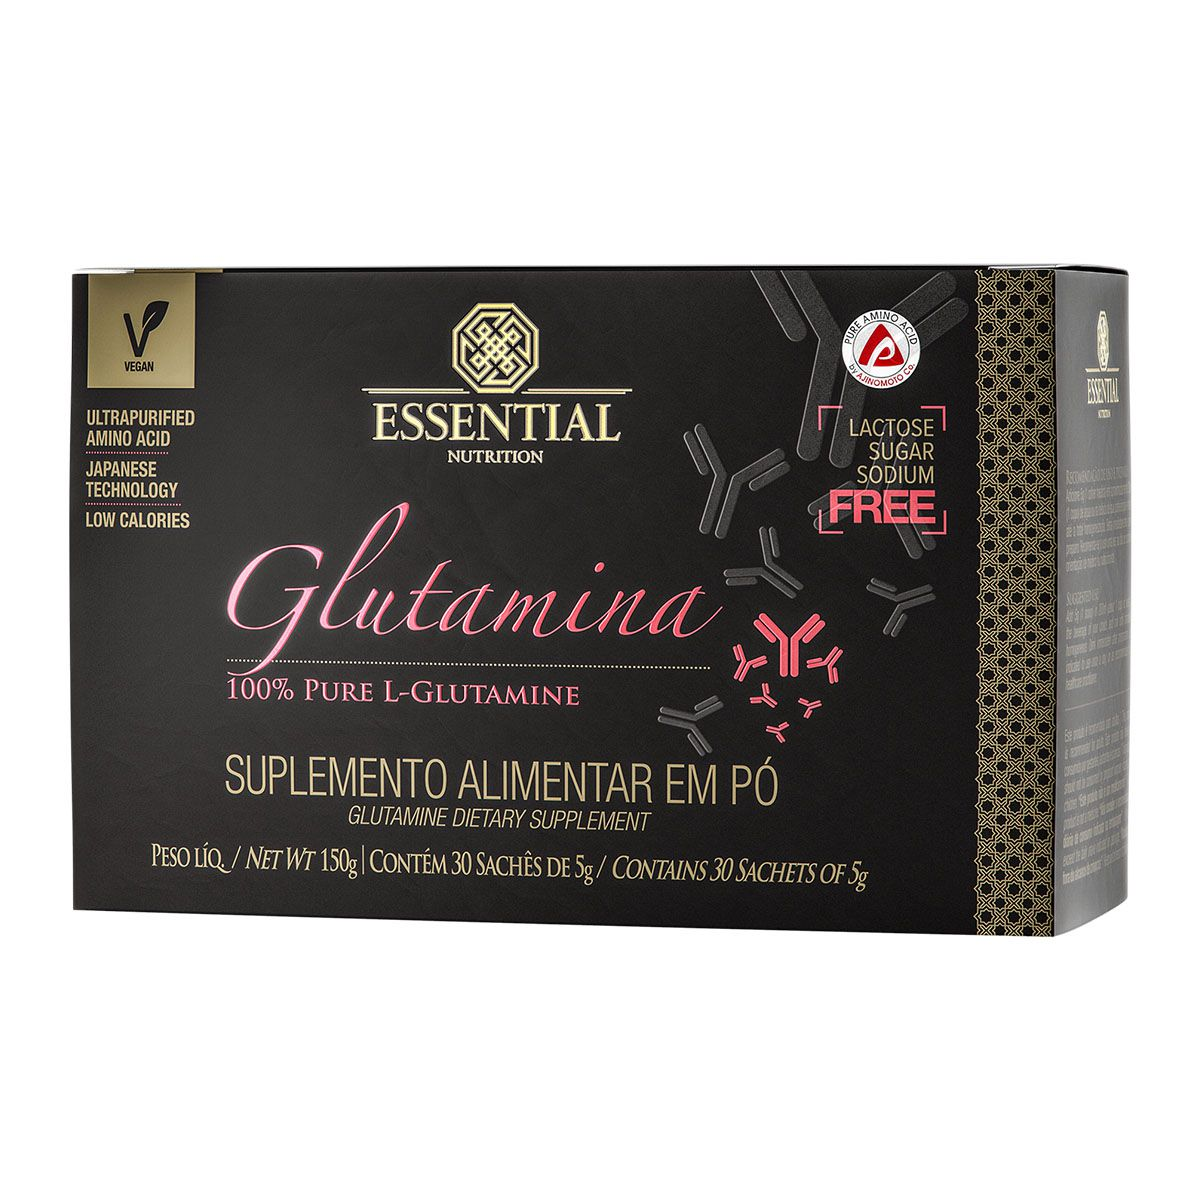 Glutamina 30 sachê 5g - Essential Nutrition